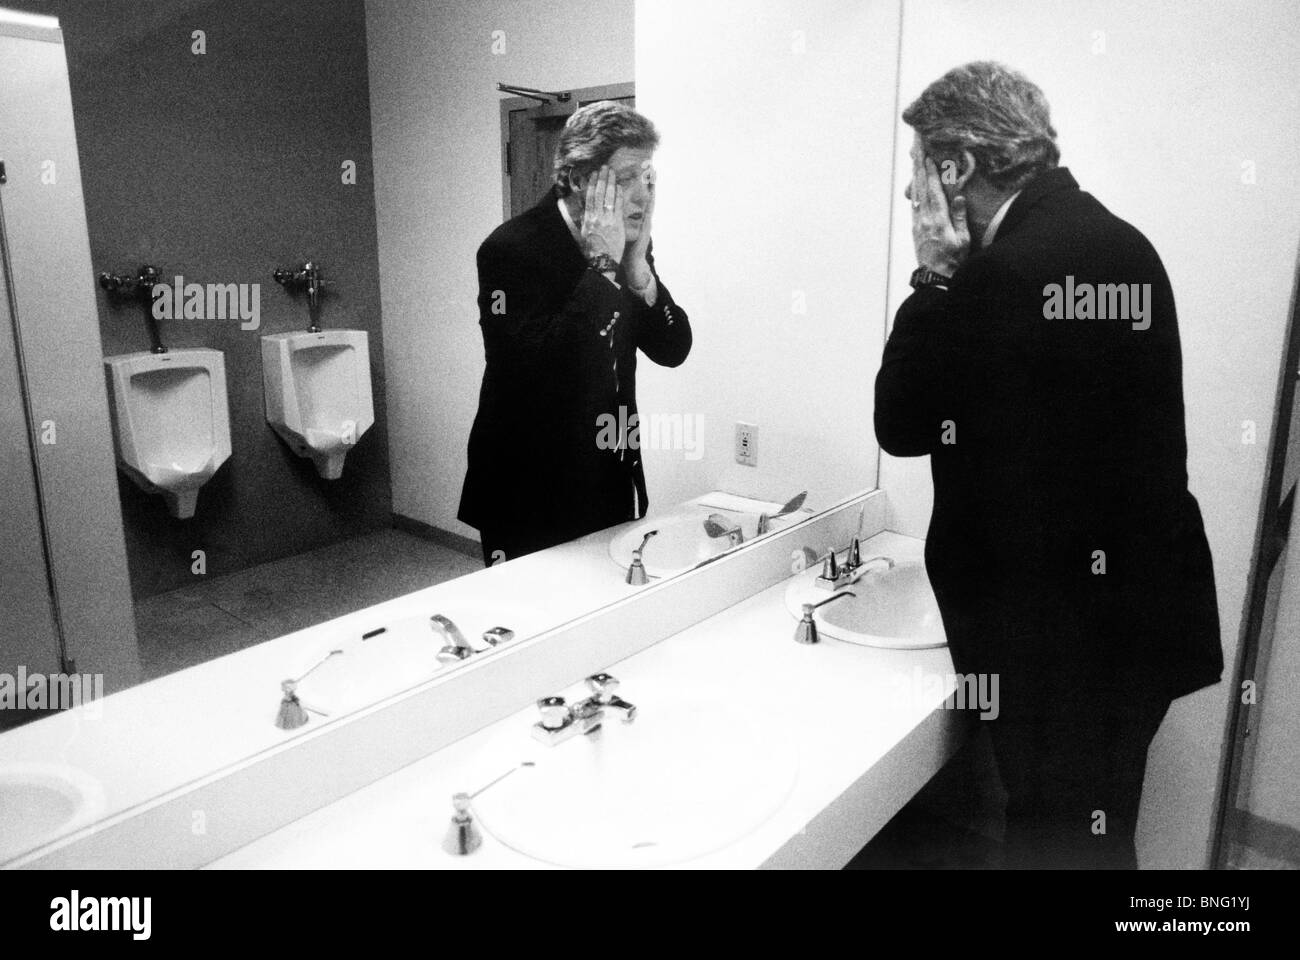 Bill Clinton In A Public Bathroom During The Election Campaignusa